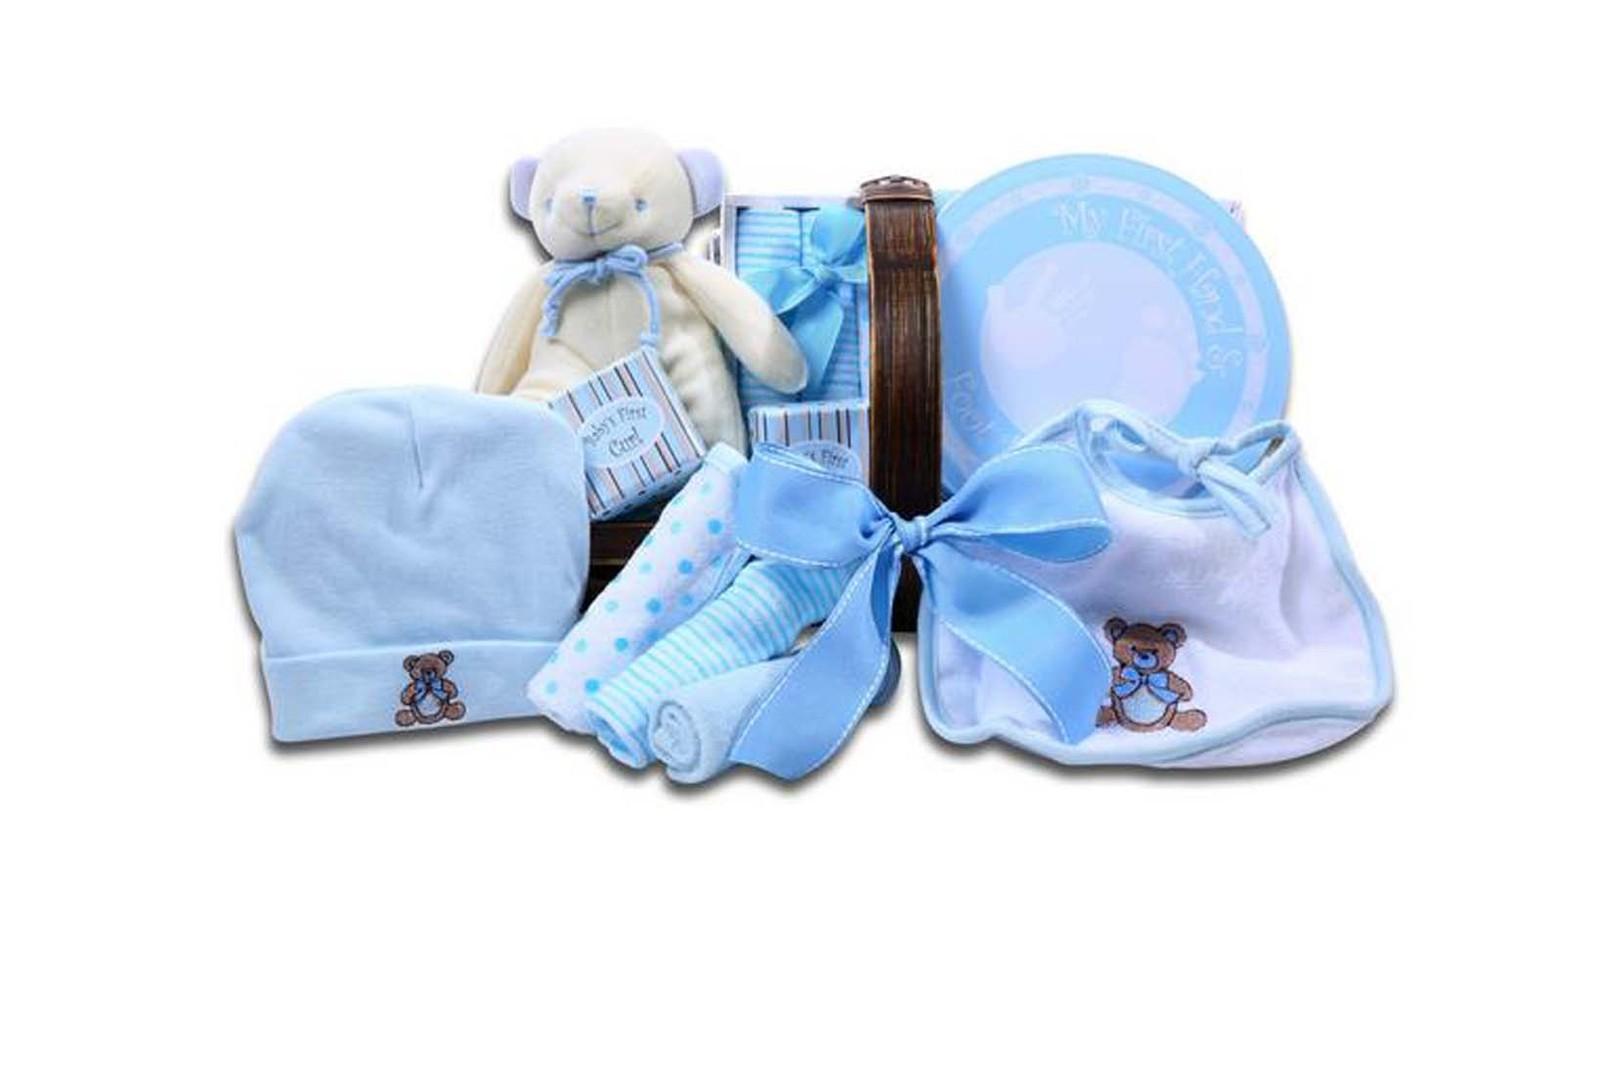 Baby Boy Gifts Nz : Darling baby boy gift basket keepsakes